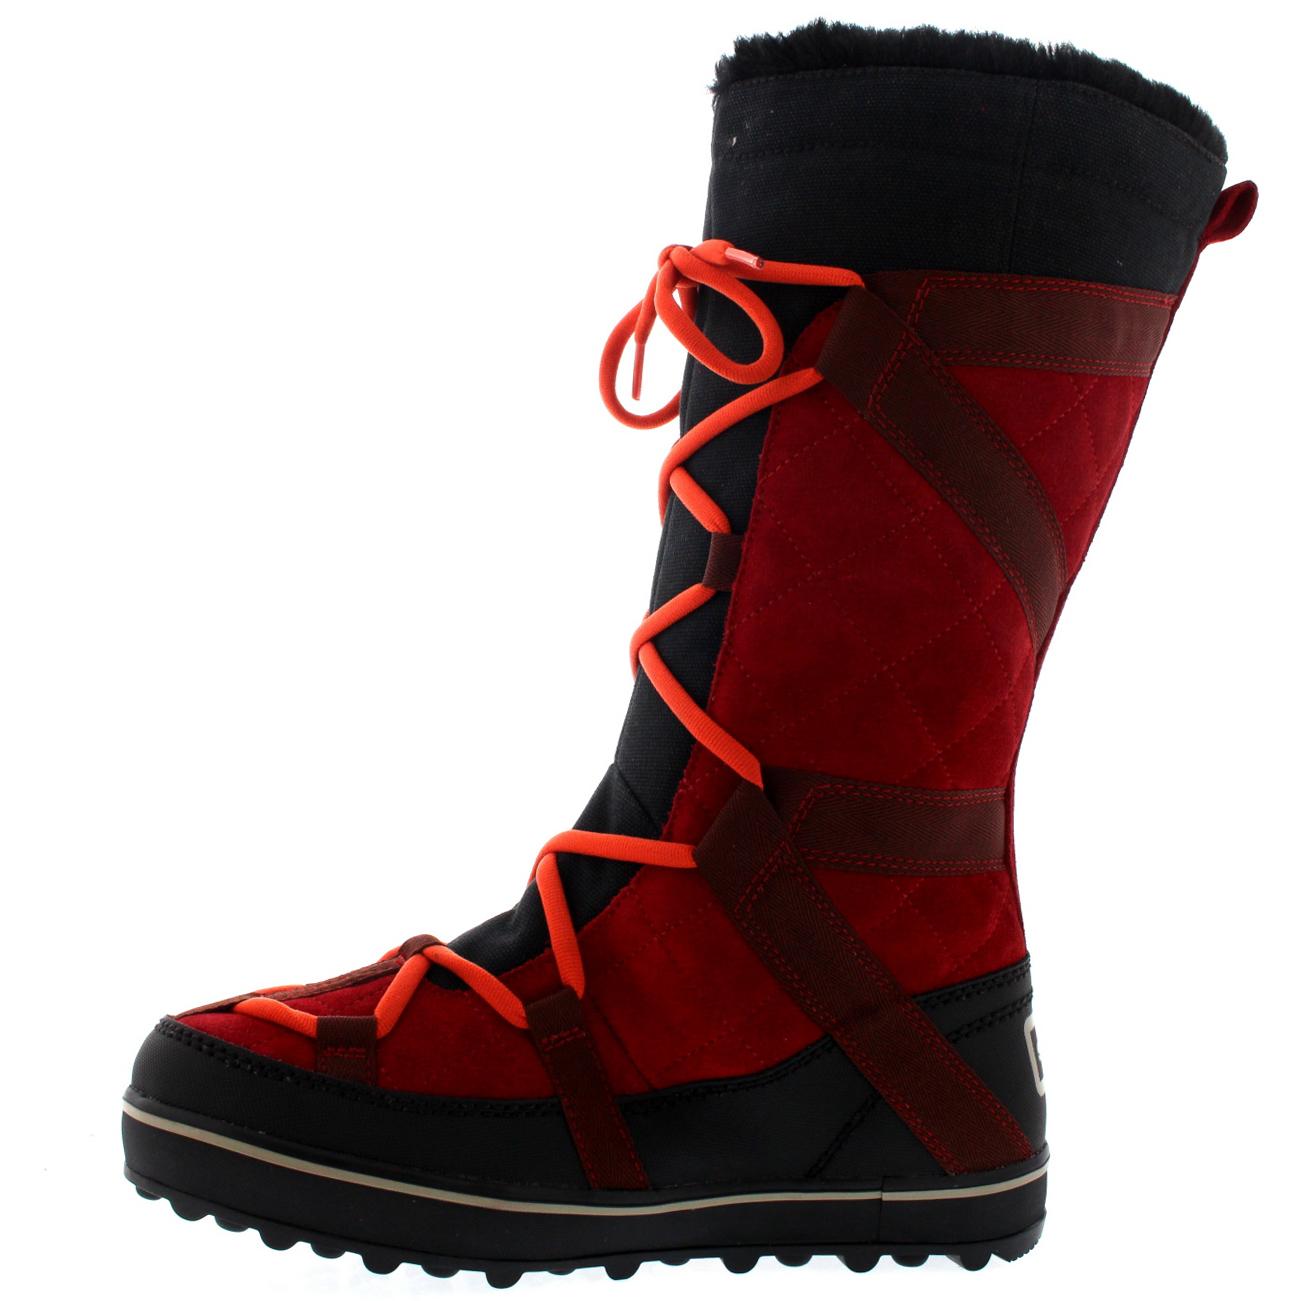 30af890d2 Sorel Ladies Snow Boots Uk | Samsung Renewable Energy Inc.